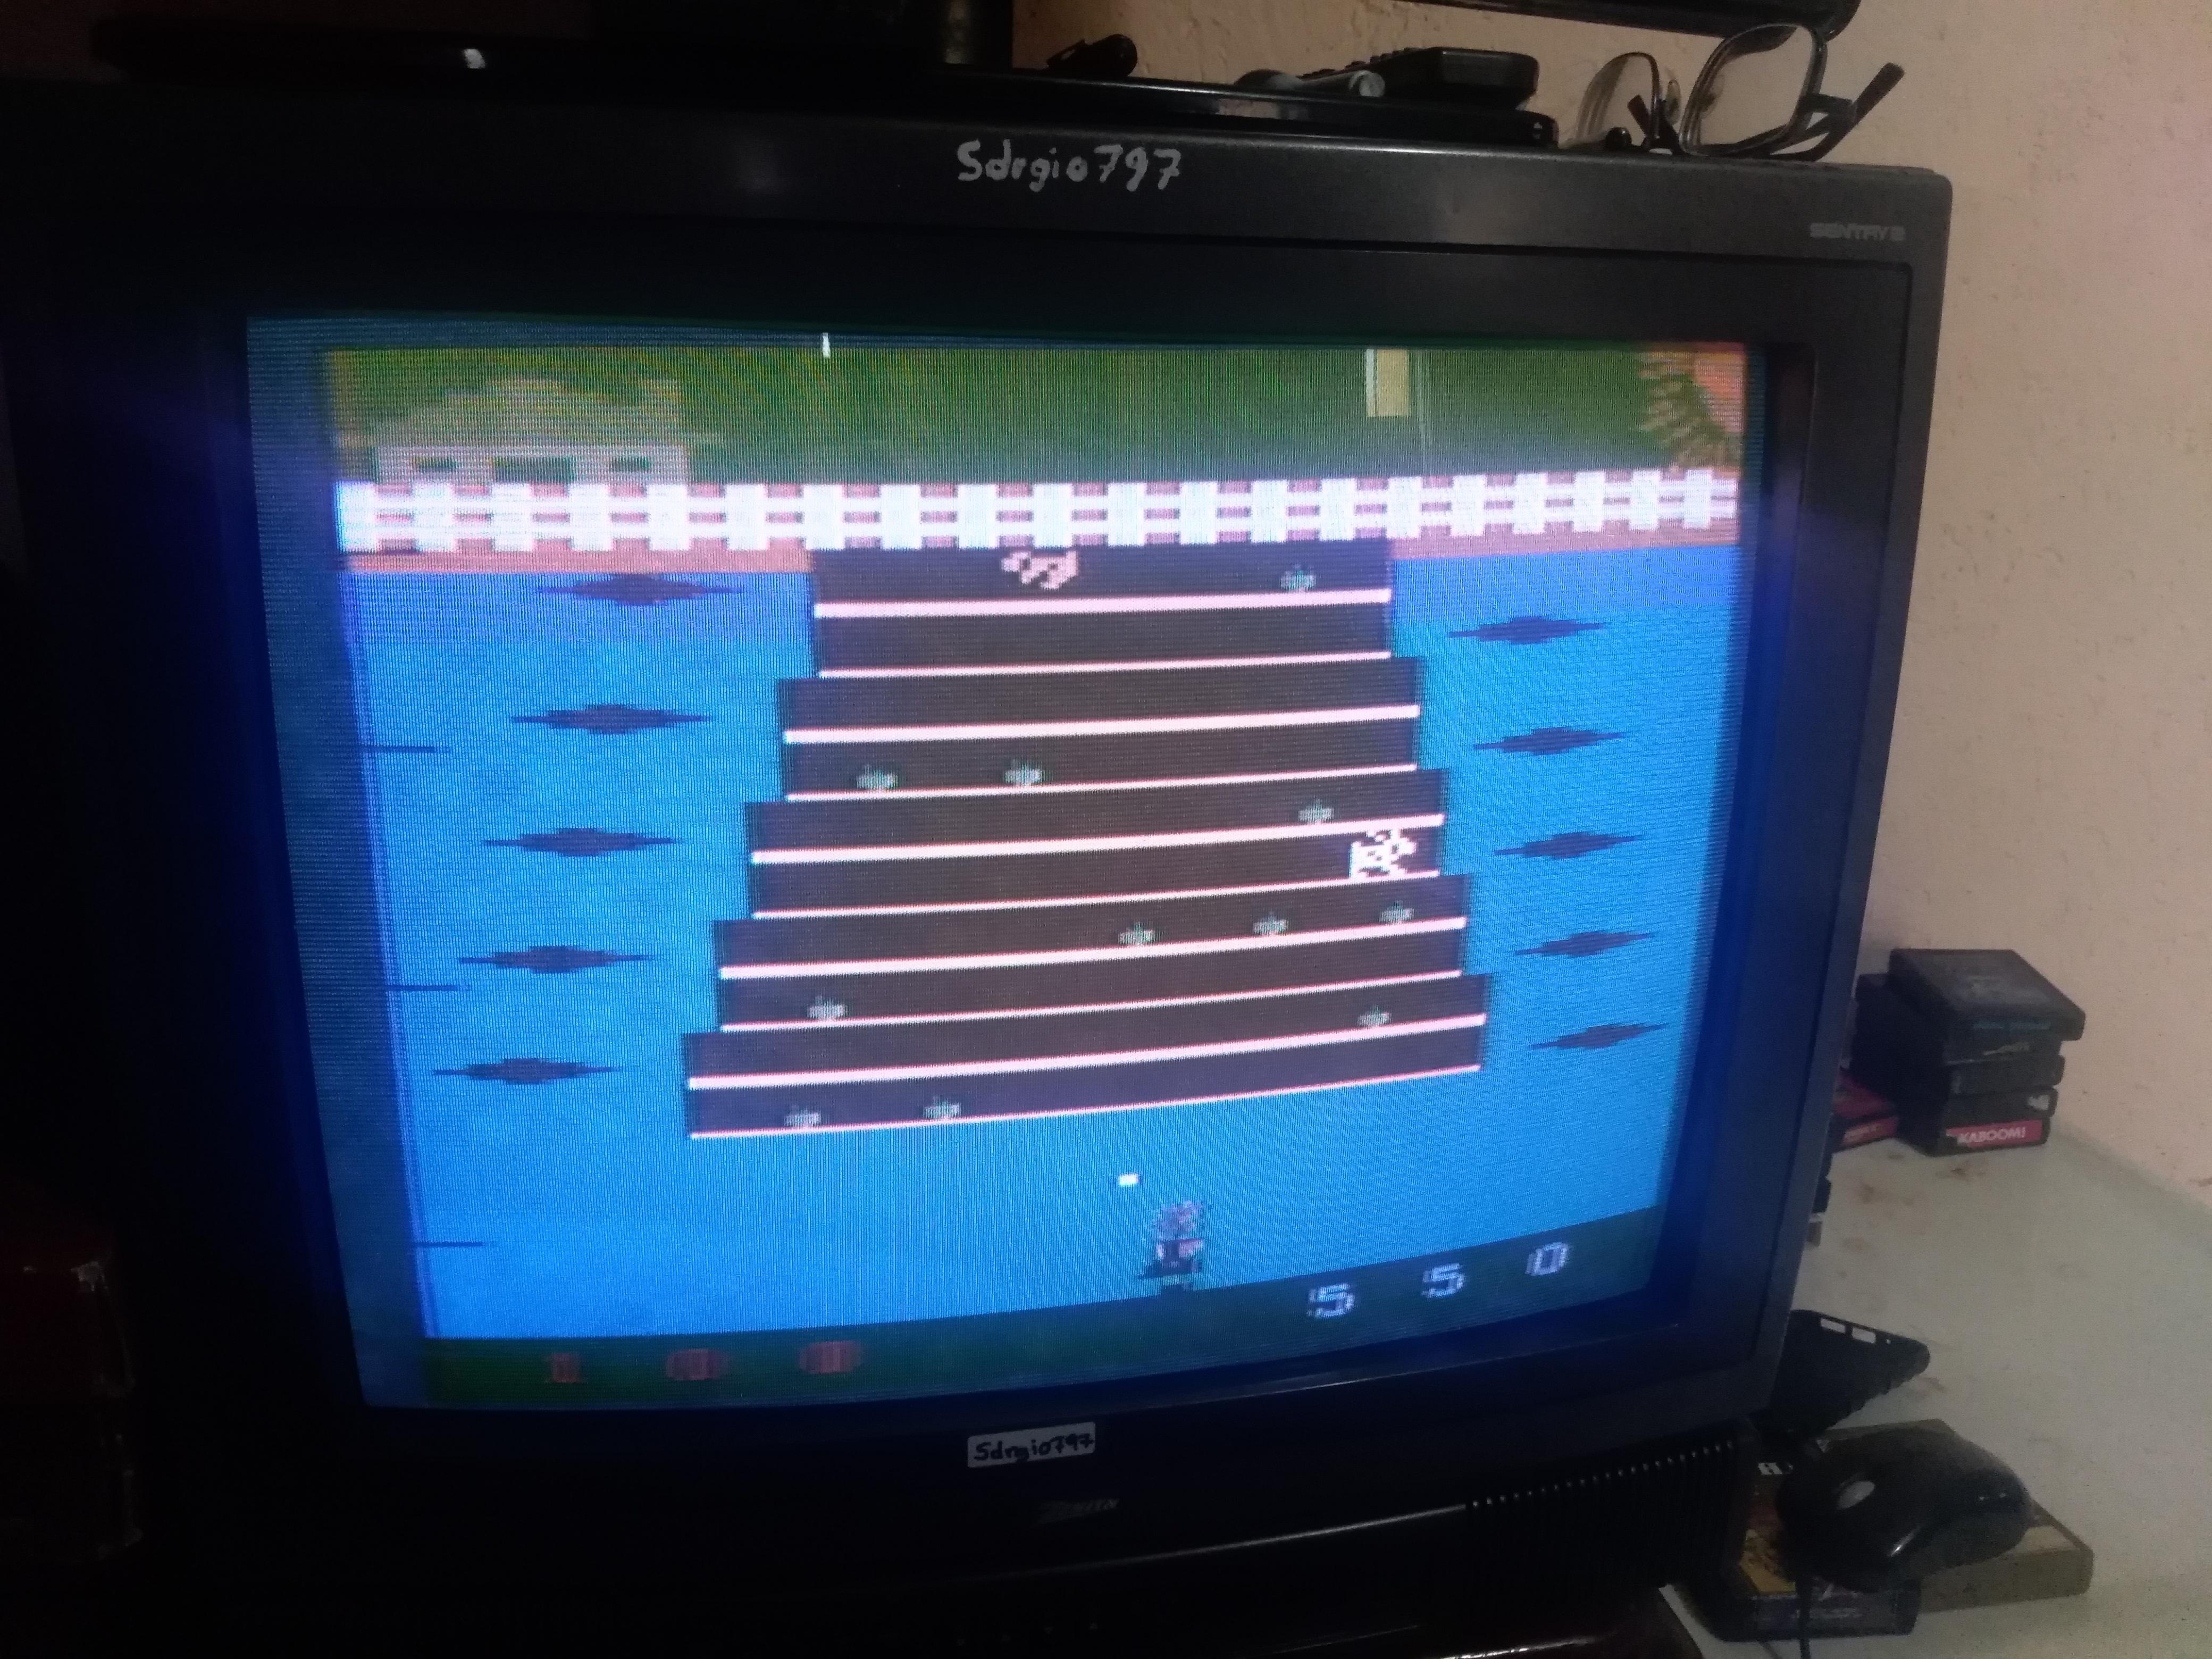 Sdrgio797: Wabbit: Game 5 (Atari 2600 Expert/A) 550 points on 2020-07-05 00:52:30